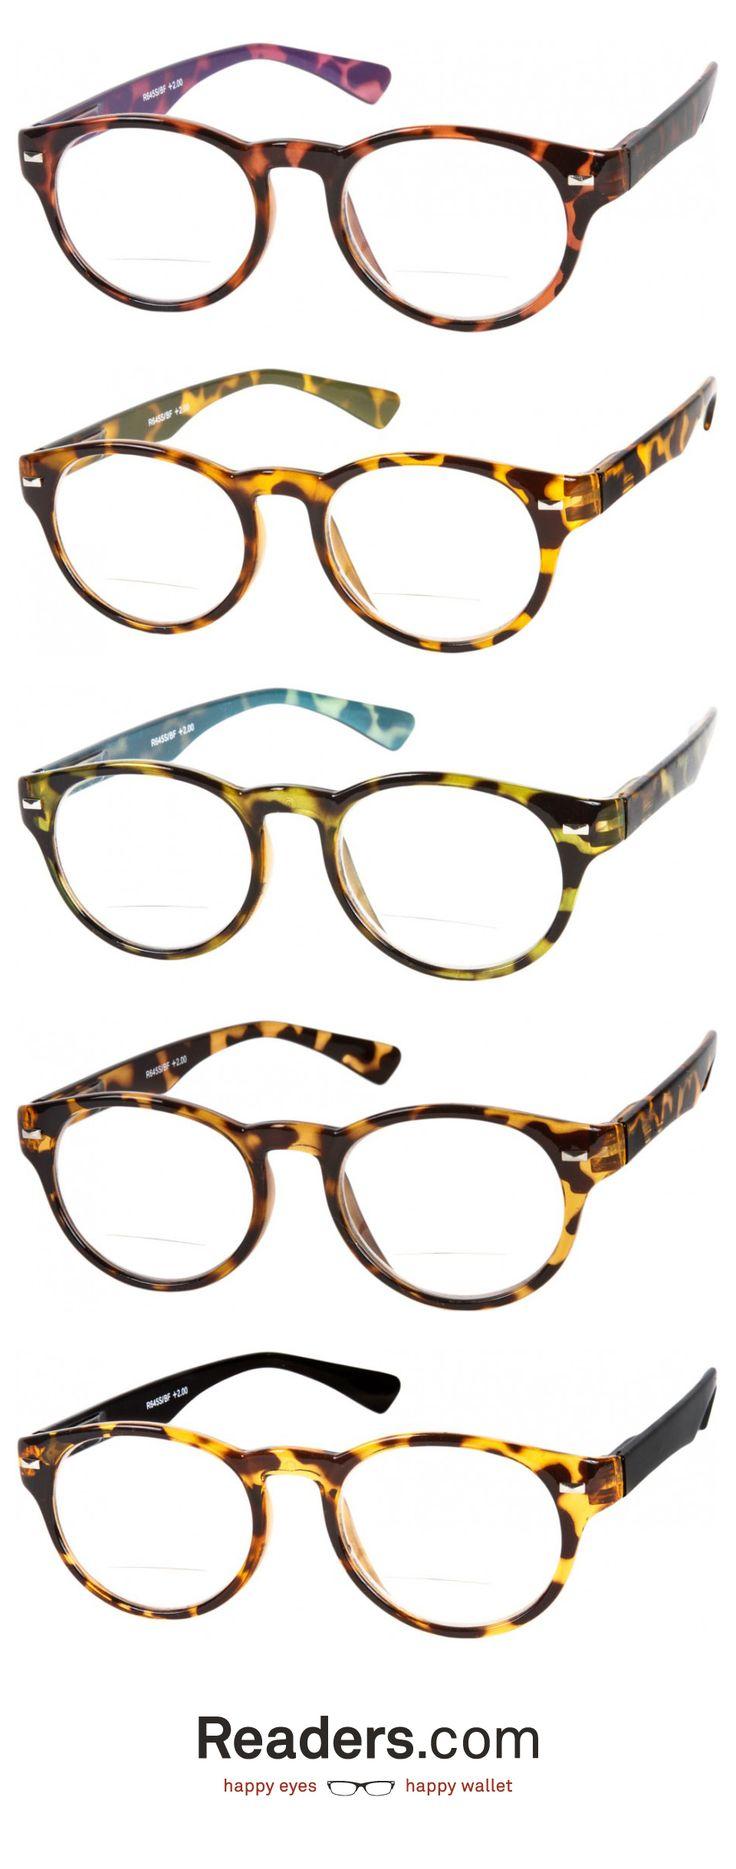 182 best Spectacles images on Pinterest | Eye glasses, General ...